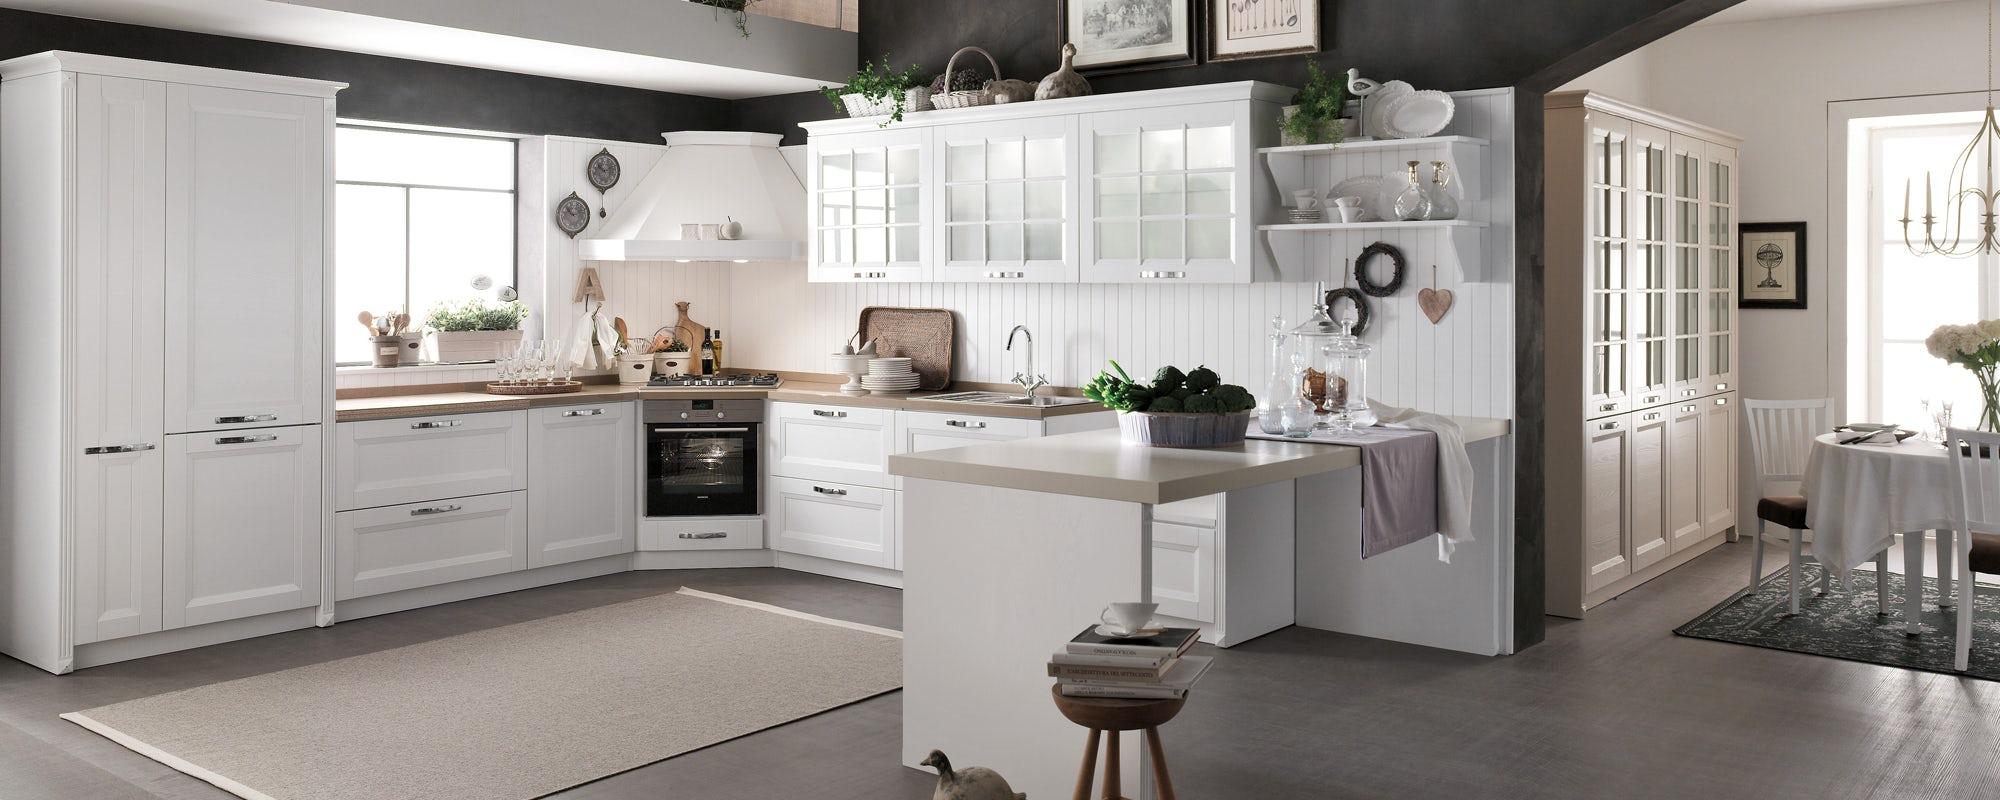 Cucine Stosa Prezzi 2018 beverly – cucine & co